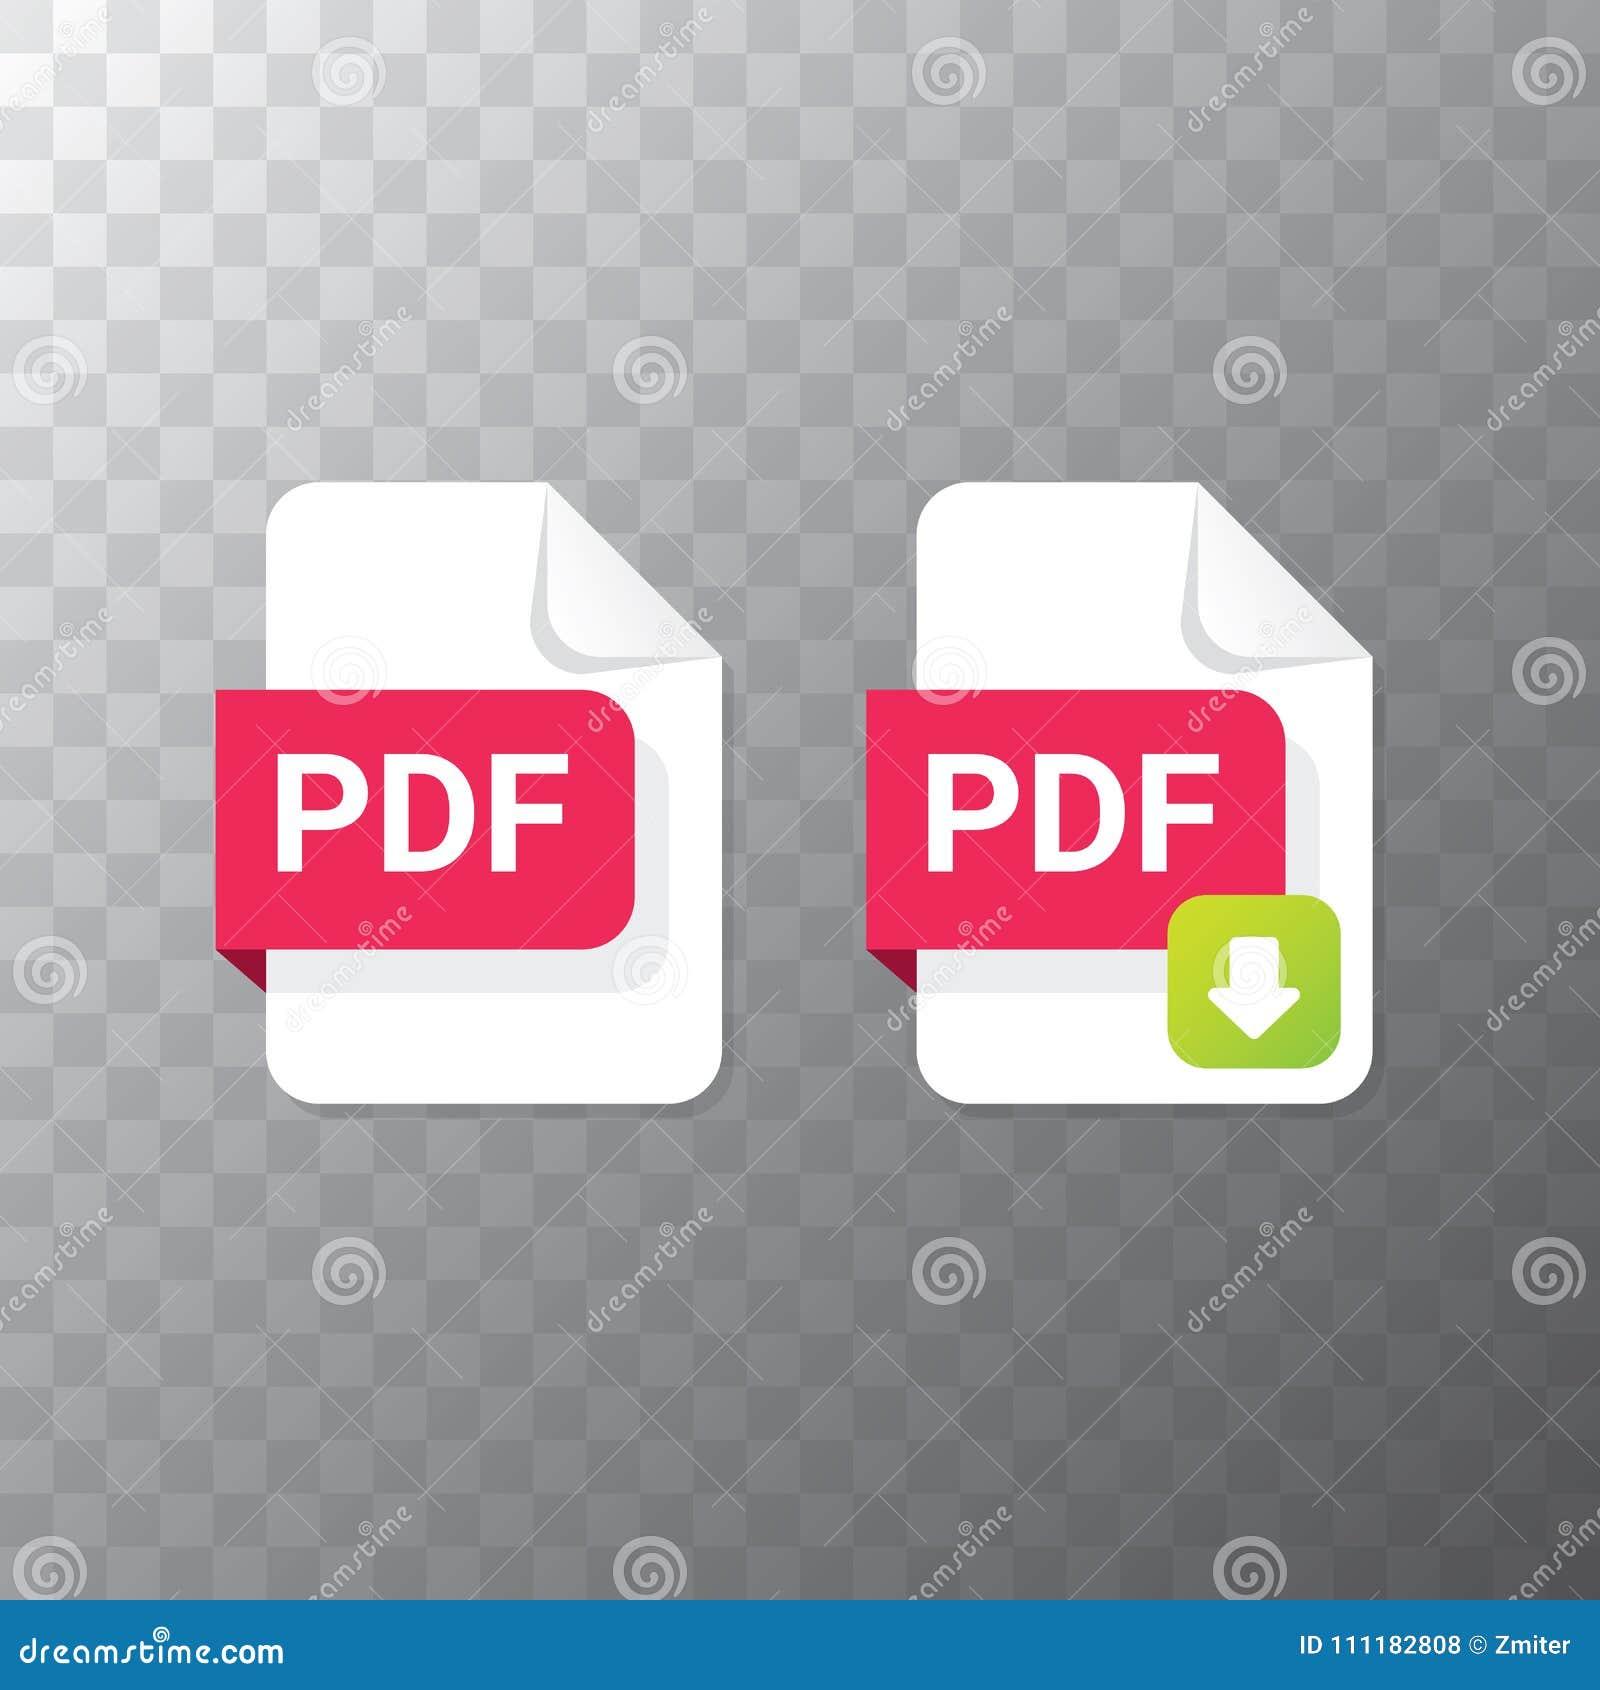 Pdf File App .com